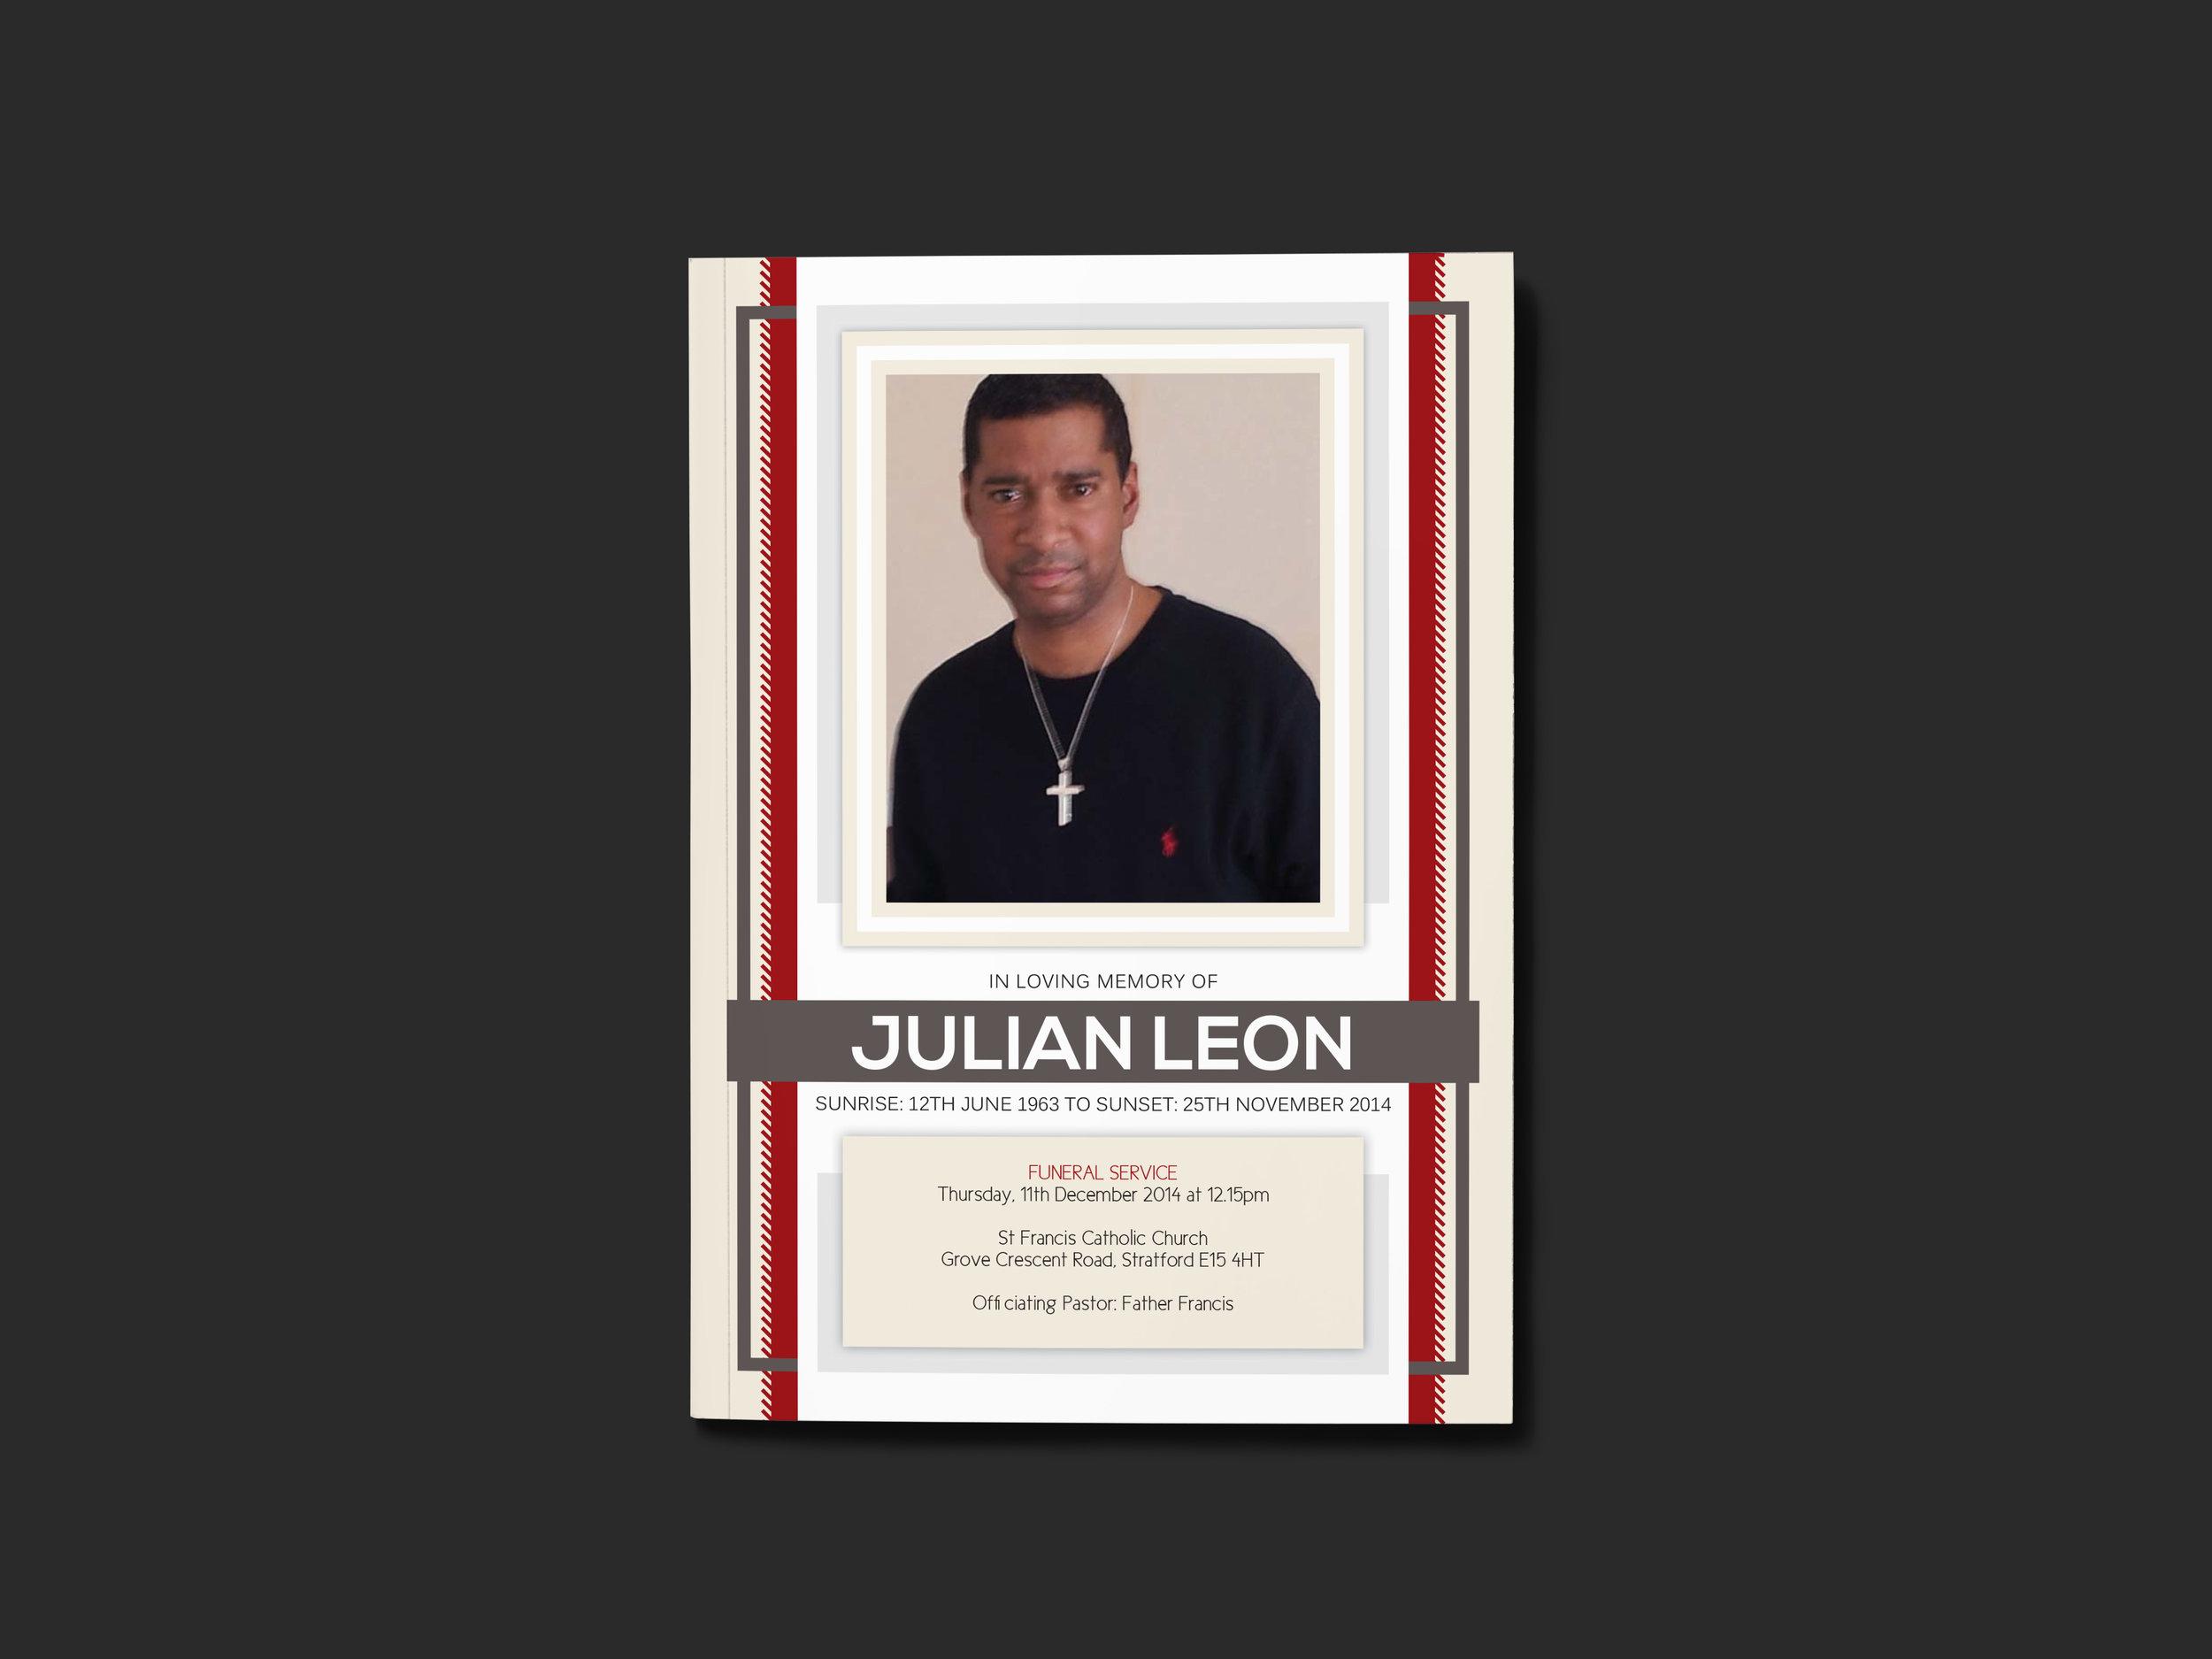 JULIAN+LEON love keeewi COVER.jpg